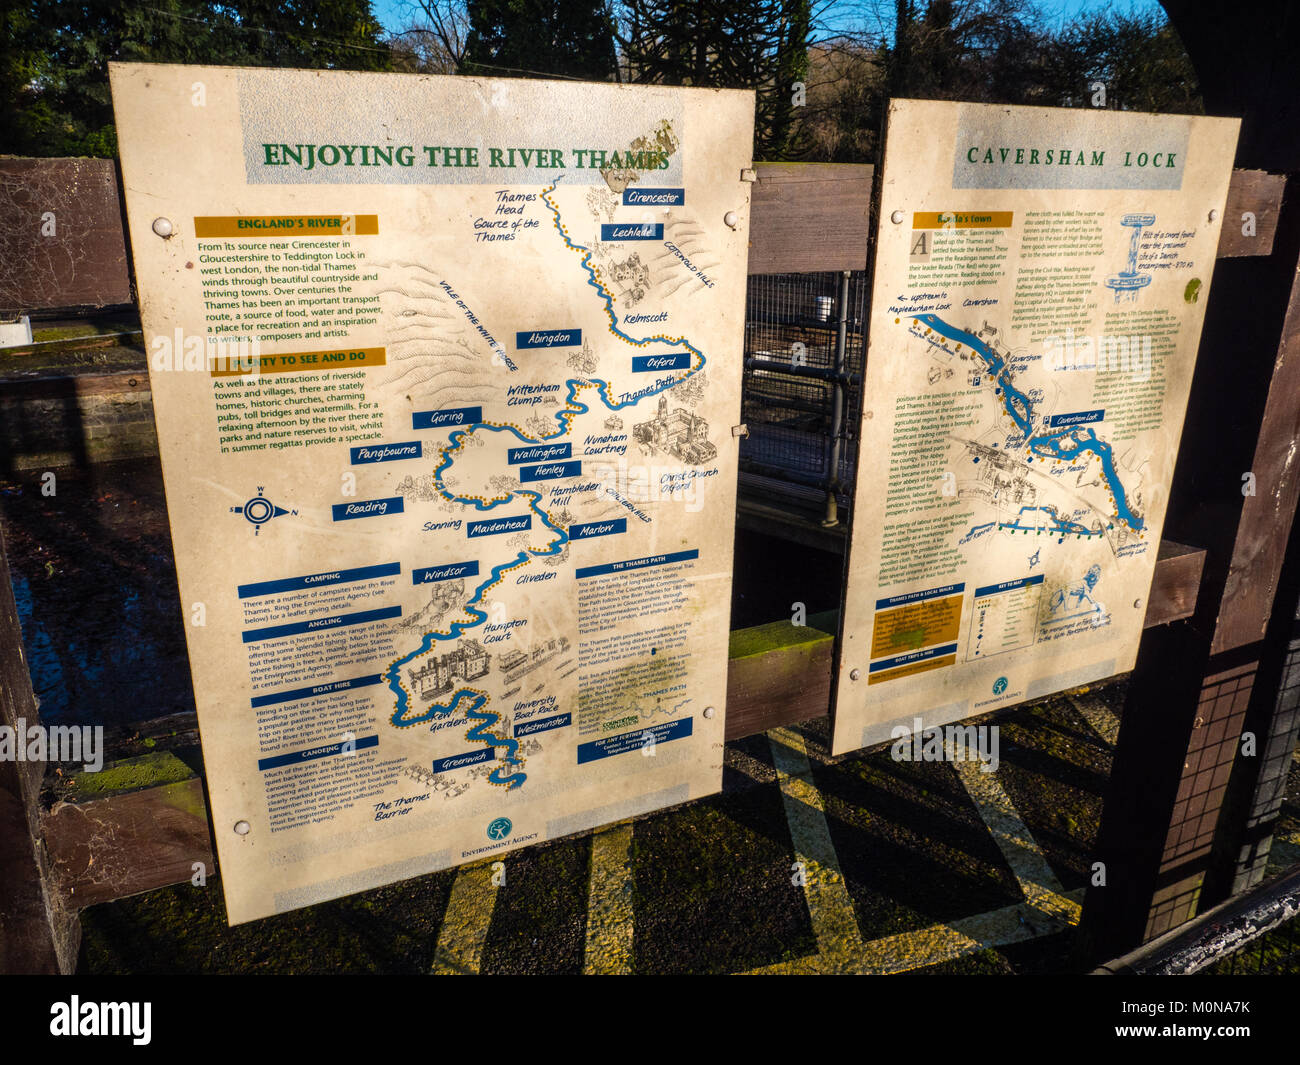 Caversham Lock, River Thames, Caversham, Reading, Berkshire, England. - Stock Image